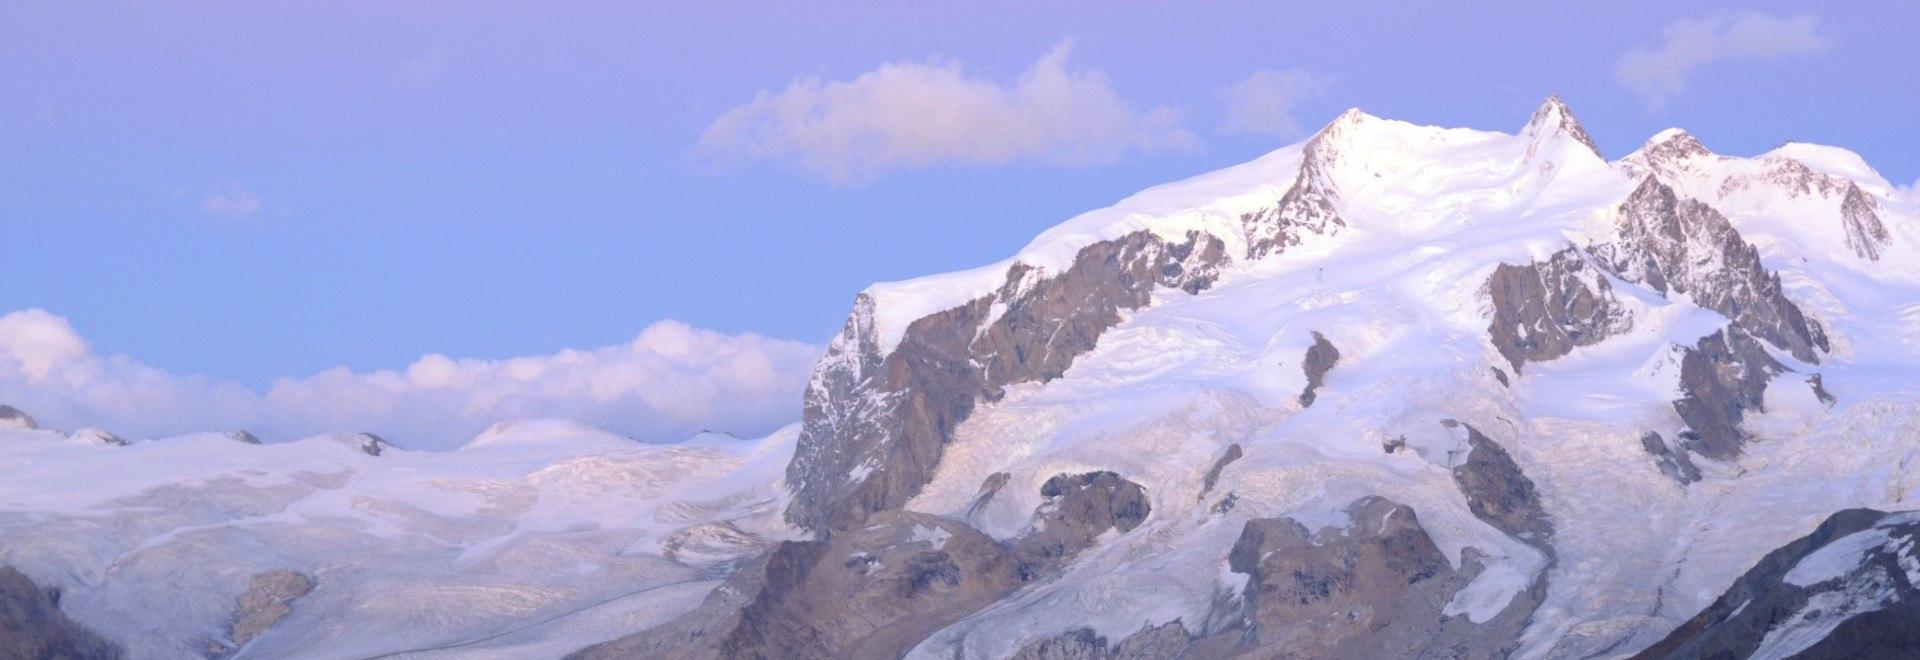 Le Alpi: natura selvaggia